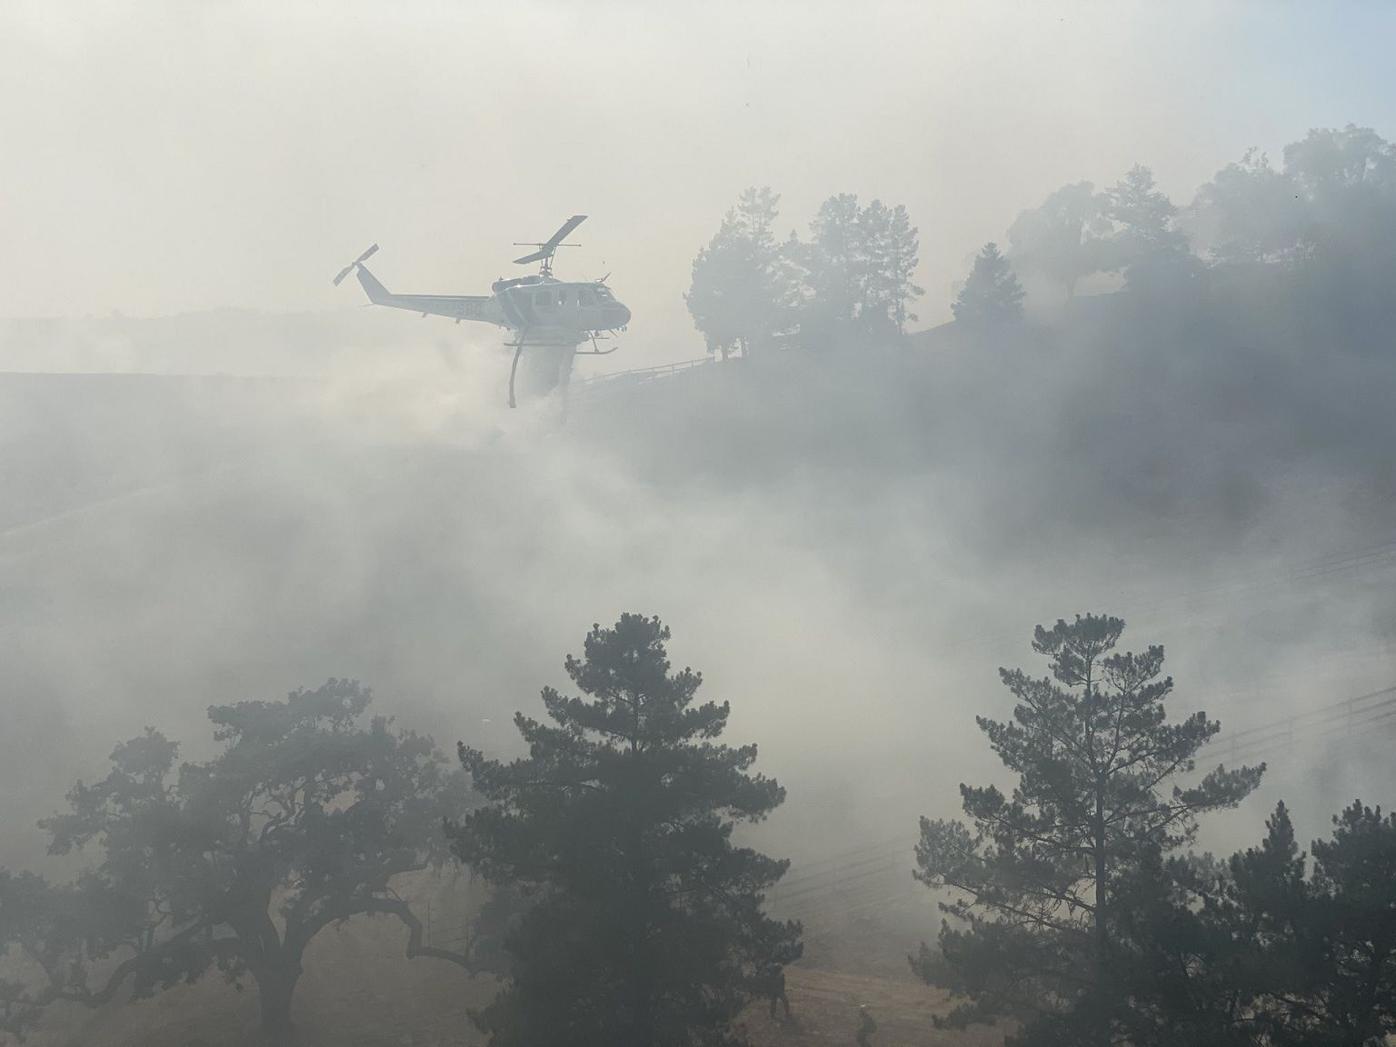 090621 Caballo fire helo in smoke.jpg